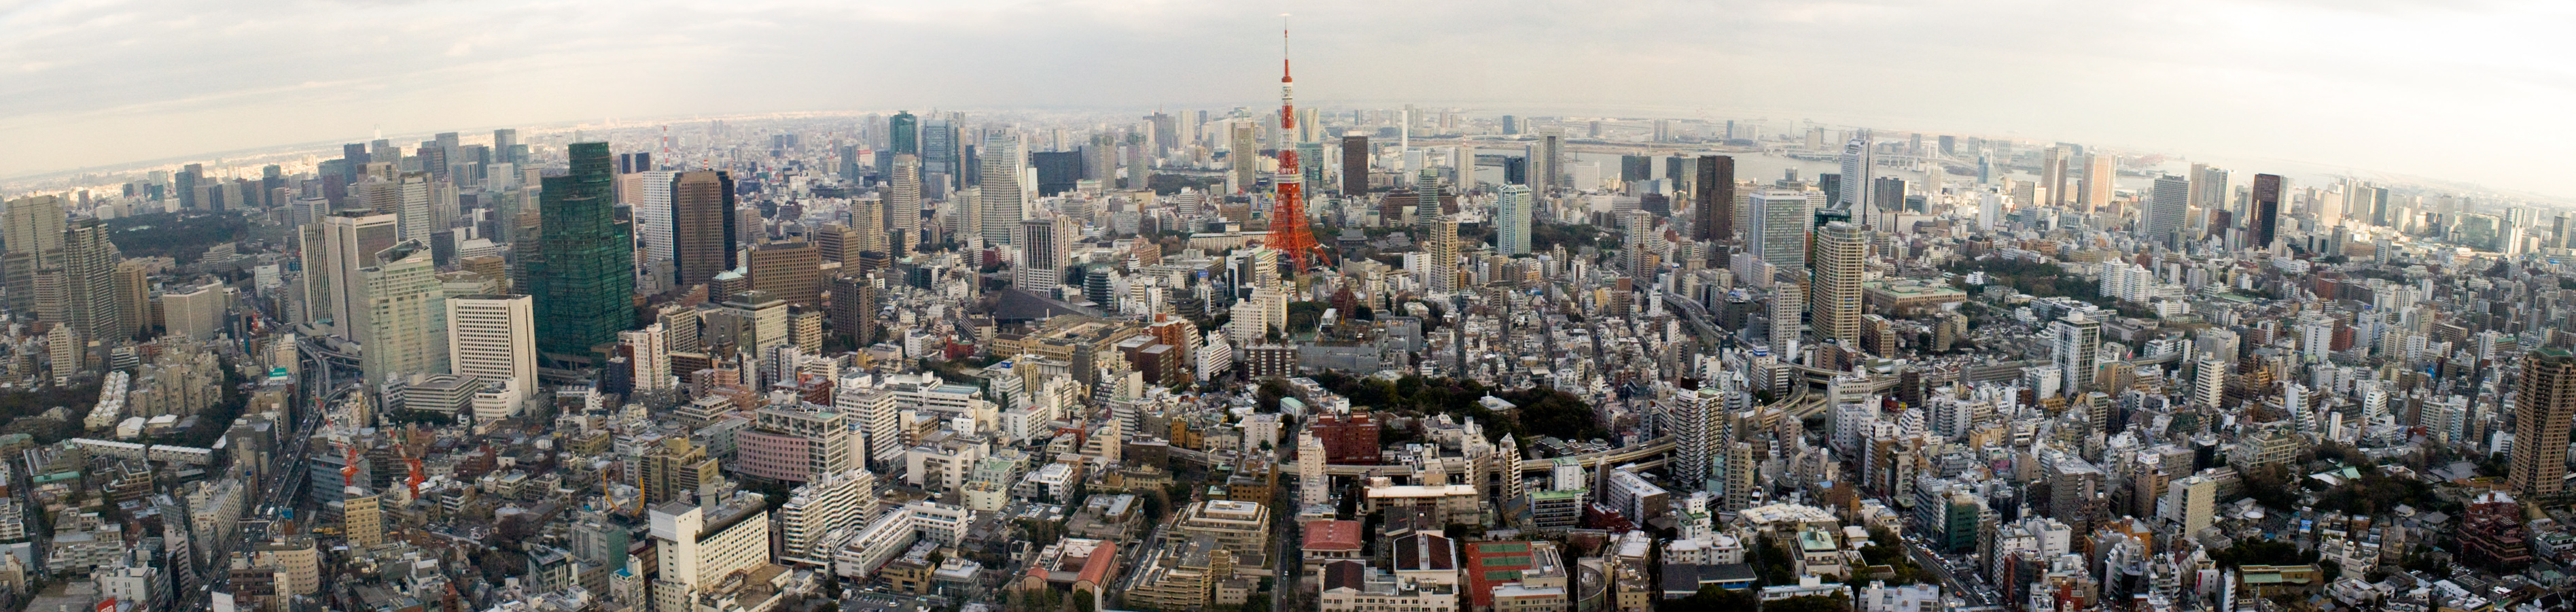 Panorama - Tokyo  2012